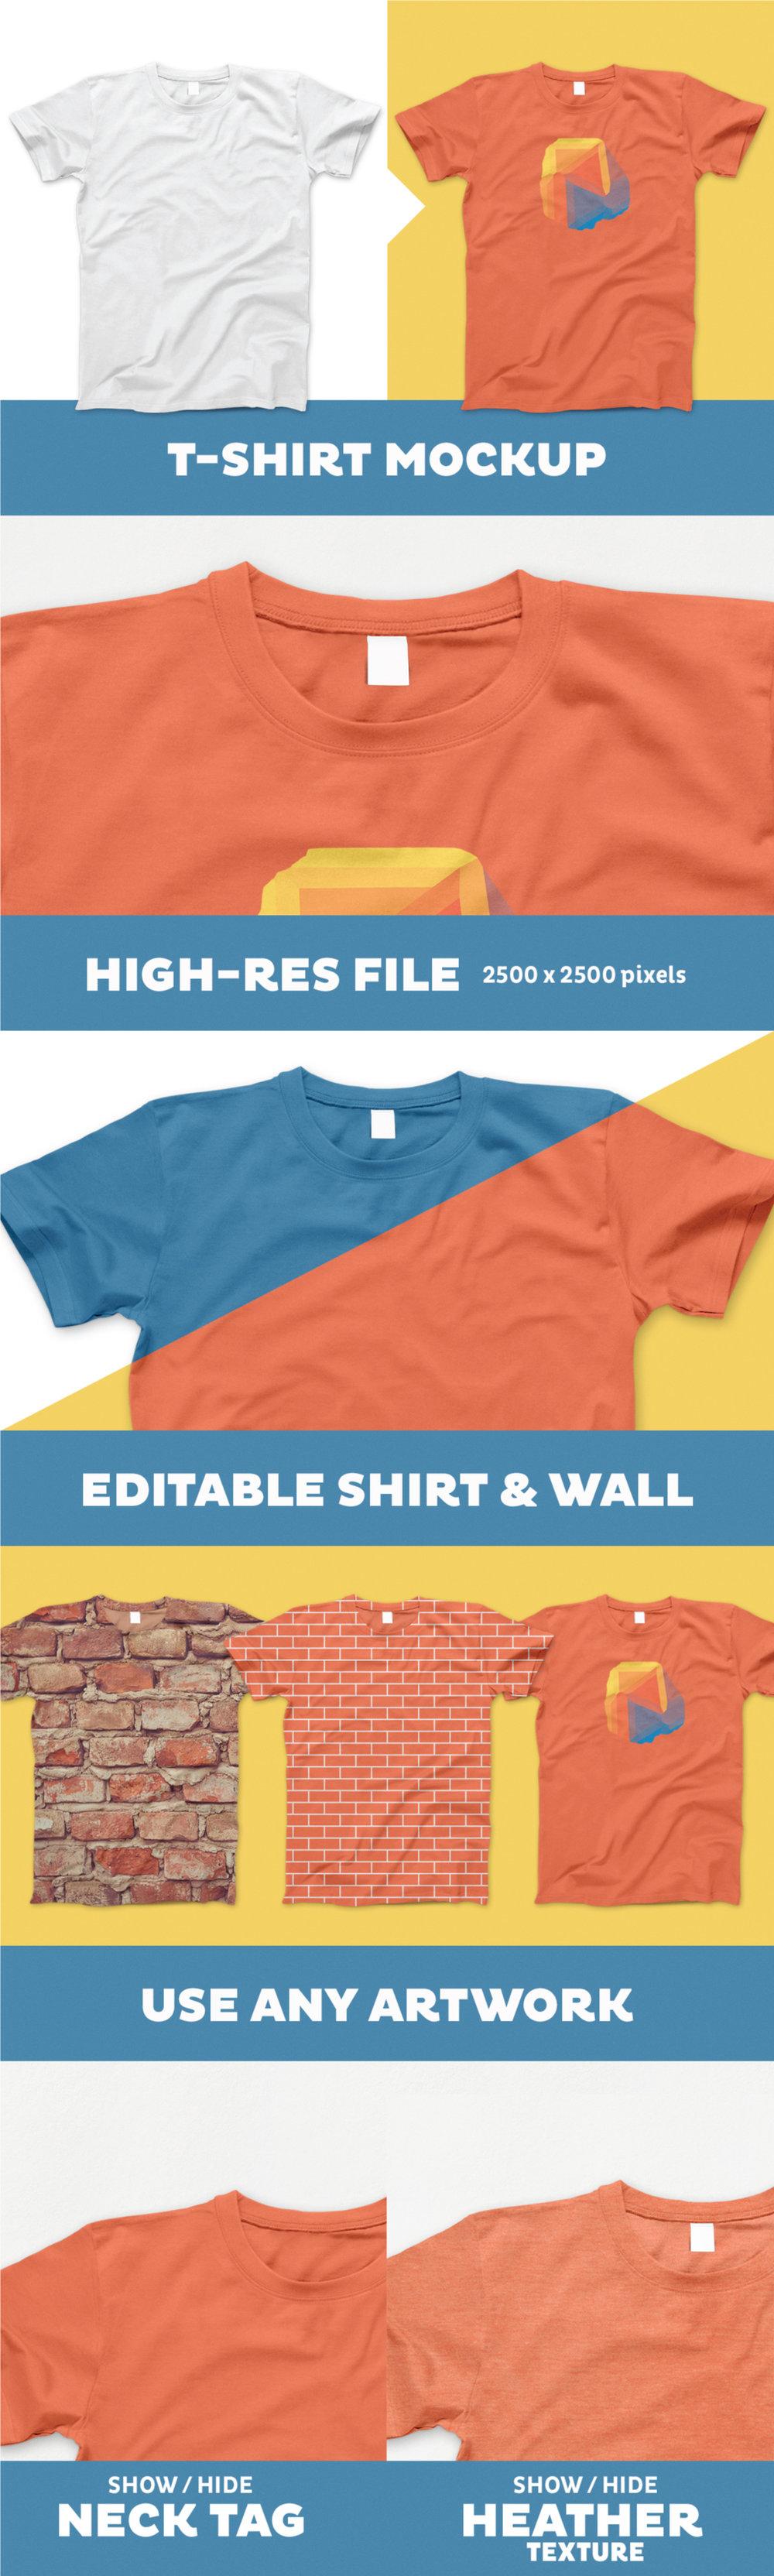 Free Editable T-Shirt PSD Mockup